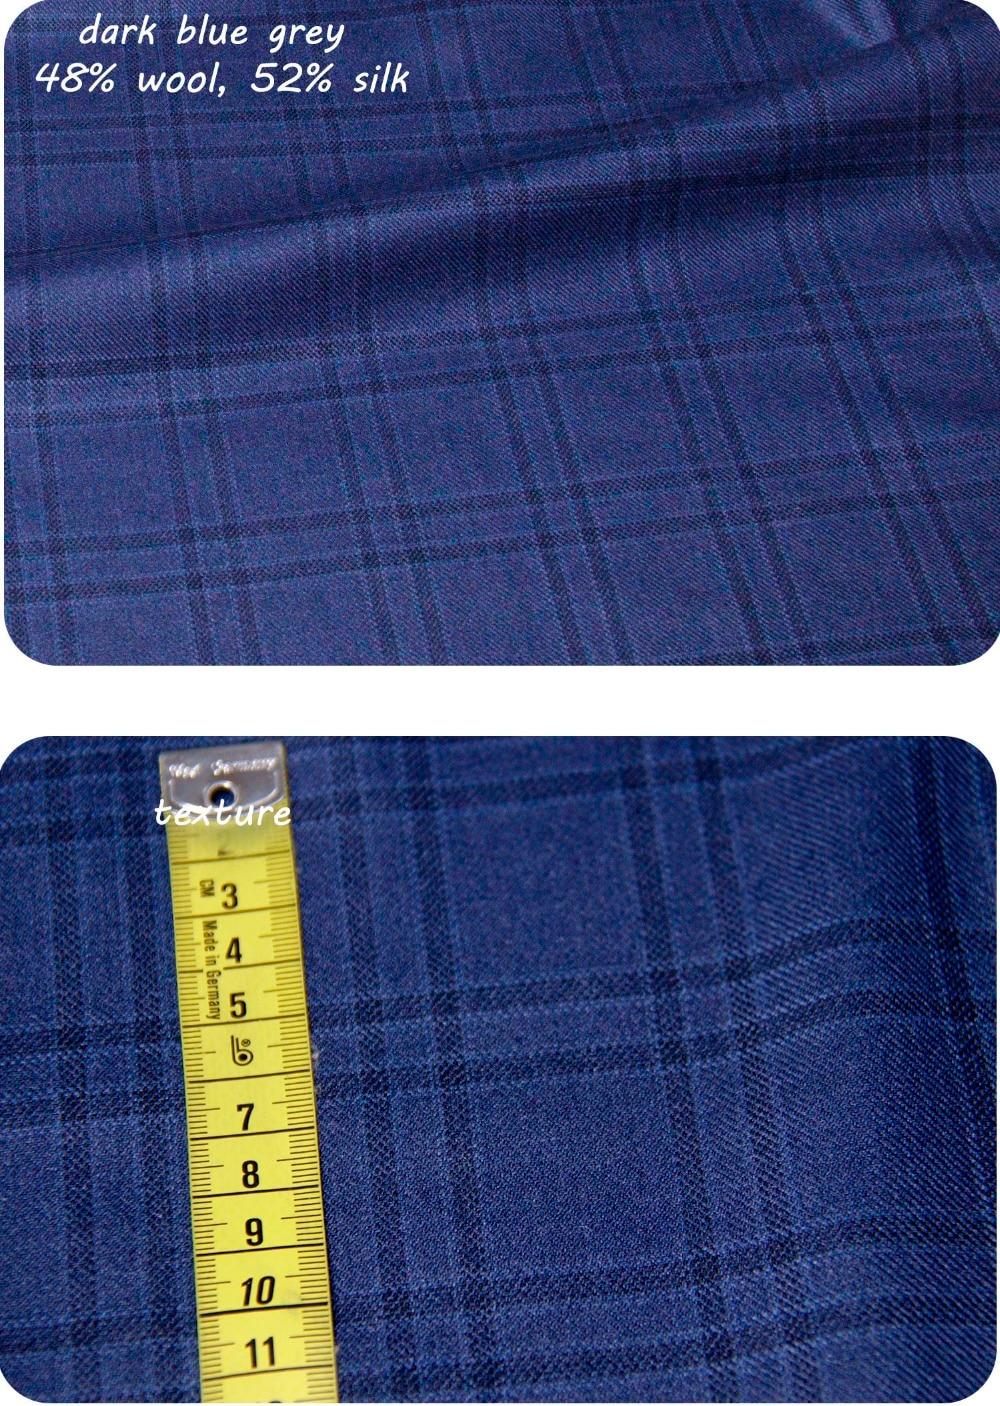 100% Virgin Wool Men Suit Custom Made Suit Luxury Wool Silk Business Suits For Men, Besopke Suit In Wool Costume Homme De Luxe